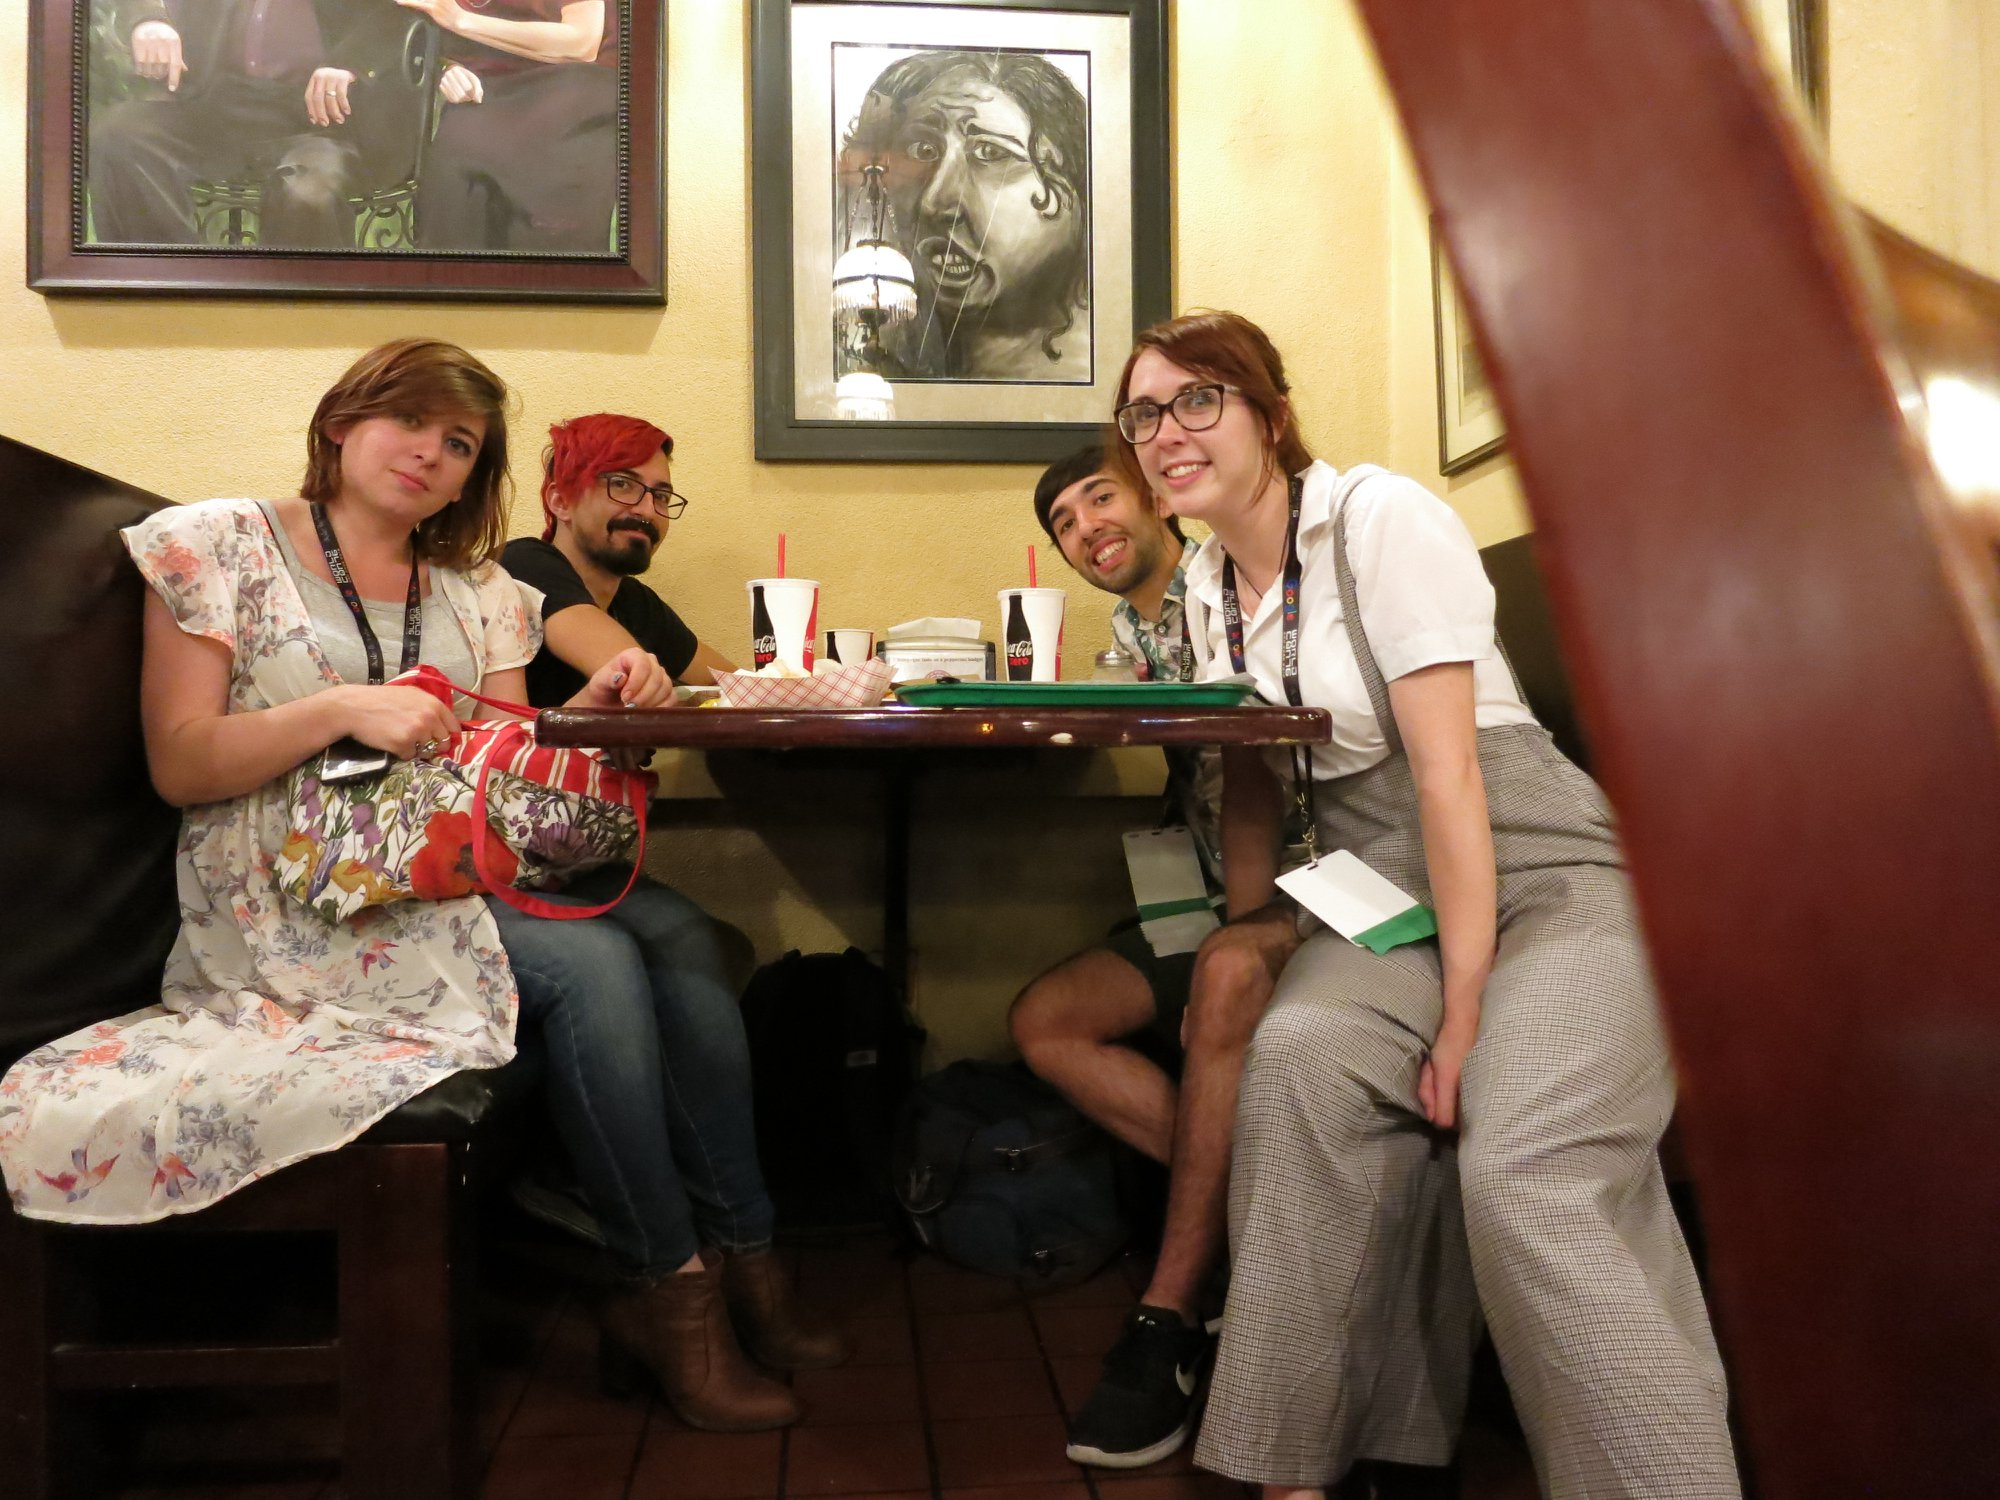 Mariana Palova, Cody Jimenez, Gonzalo Alvarez, and Grace Chadwick bonding over food at Worldcon 76 (Photo by Anonymous, taken on Gonzalo's phone)